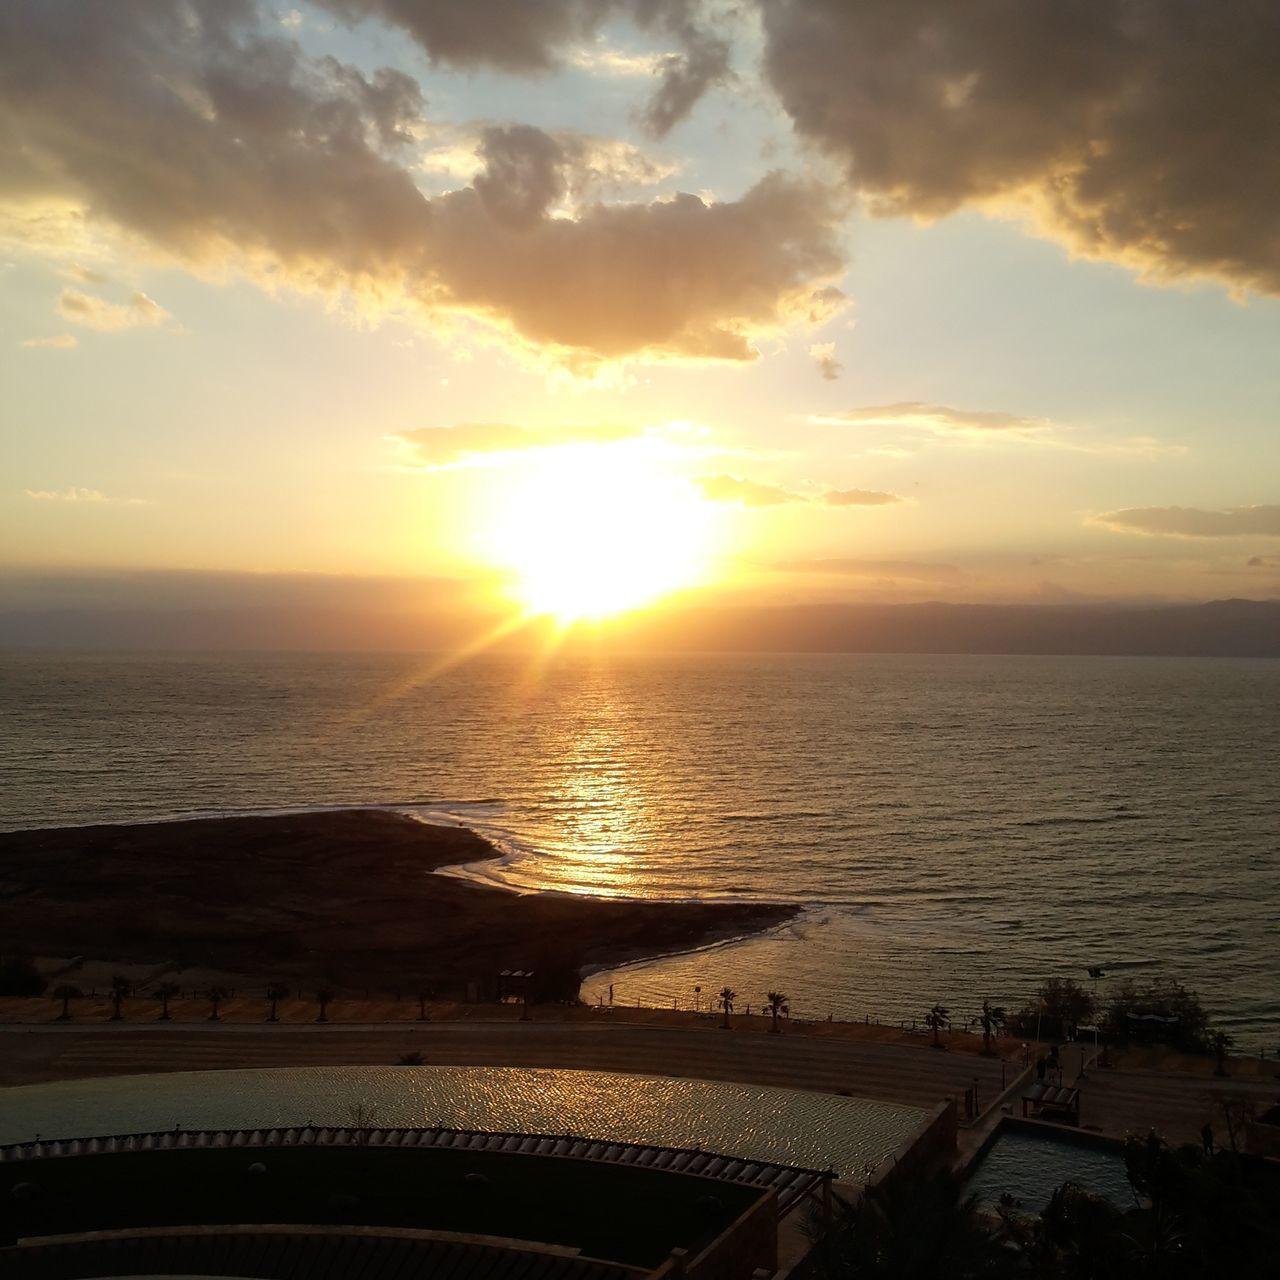 Sunset Deadsea Jordan Noeffect Nofilter Nature Beauty